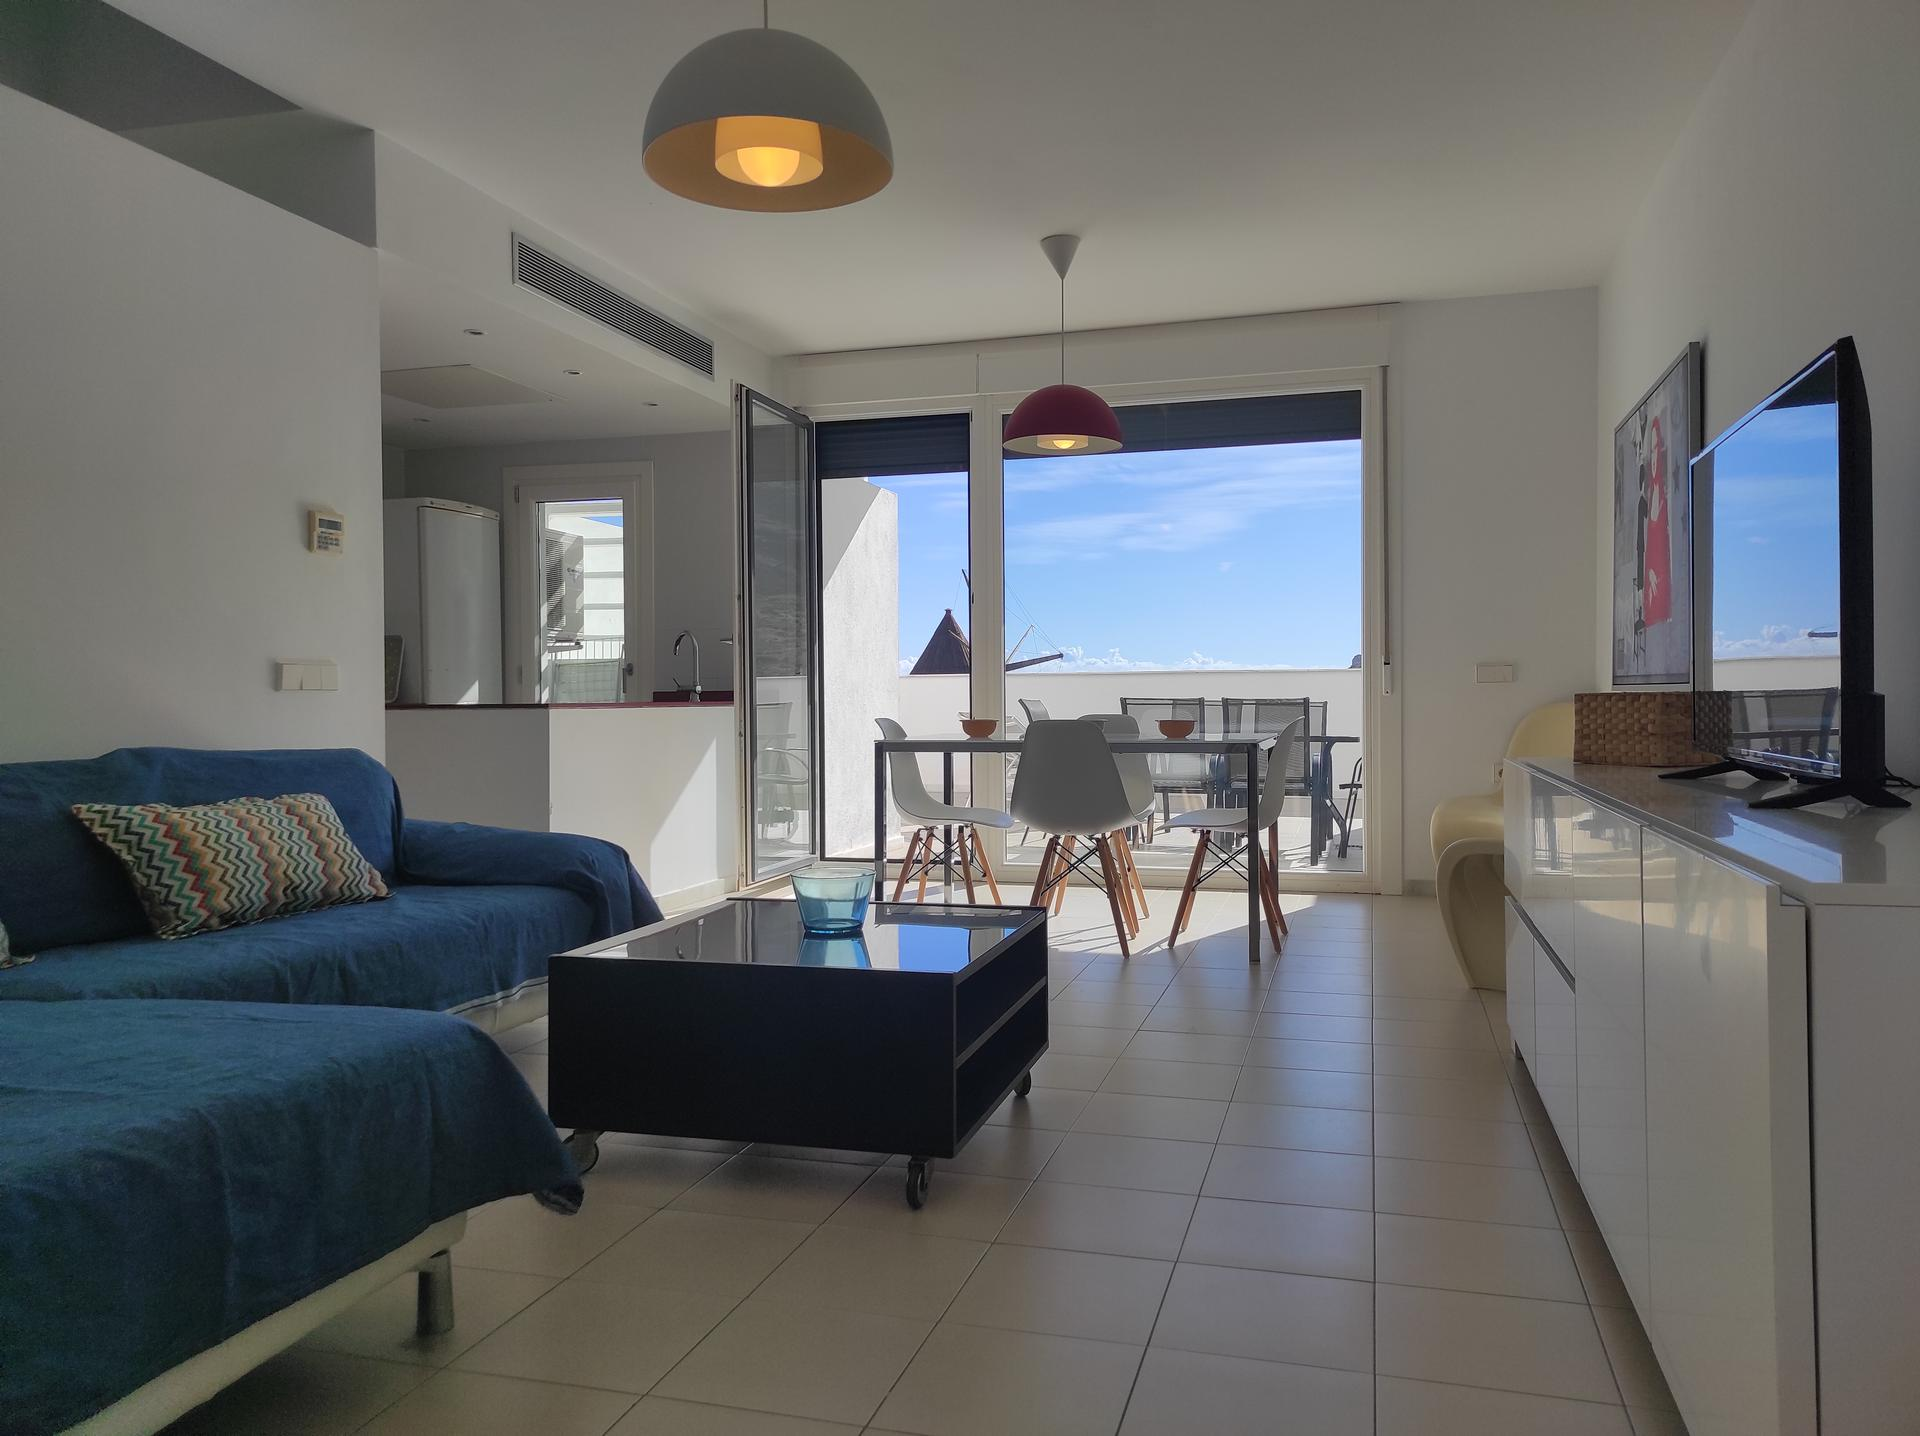 Apartamento -                                       Las Negras -                                       2 dormitorios -                                       4 ocupantes